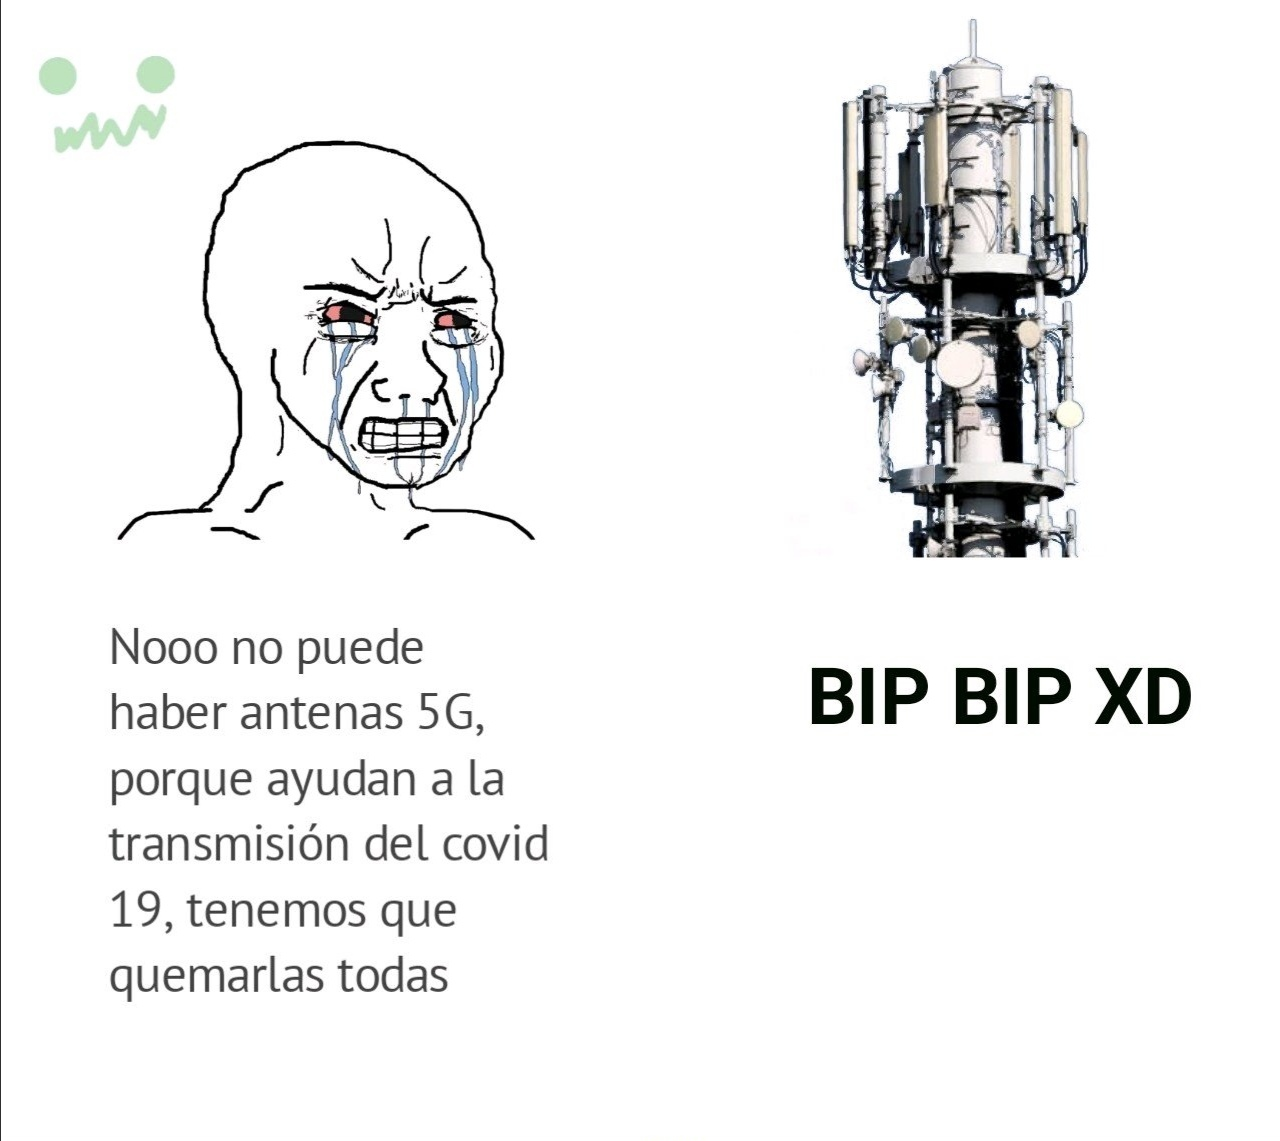 Bip Bip XD............no porque tenga un XD significa que sea panafresco o papulince - meme